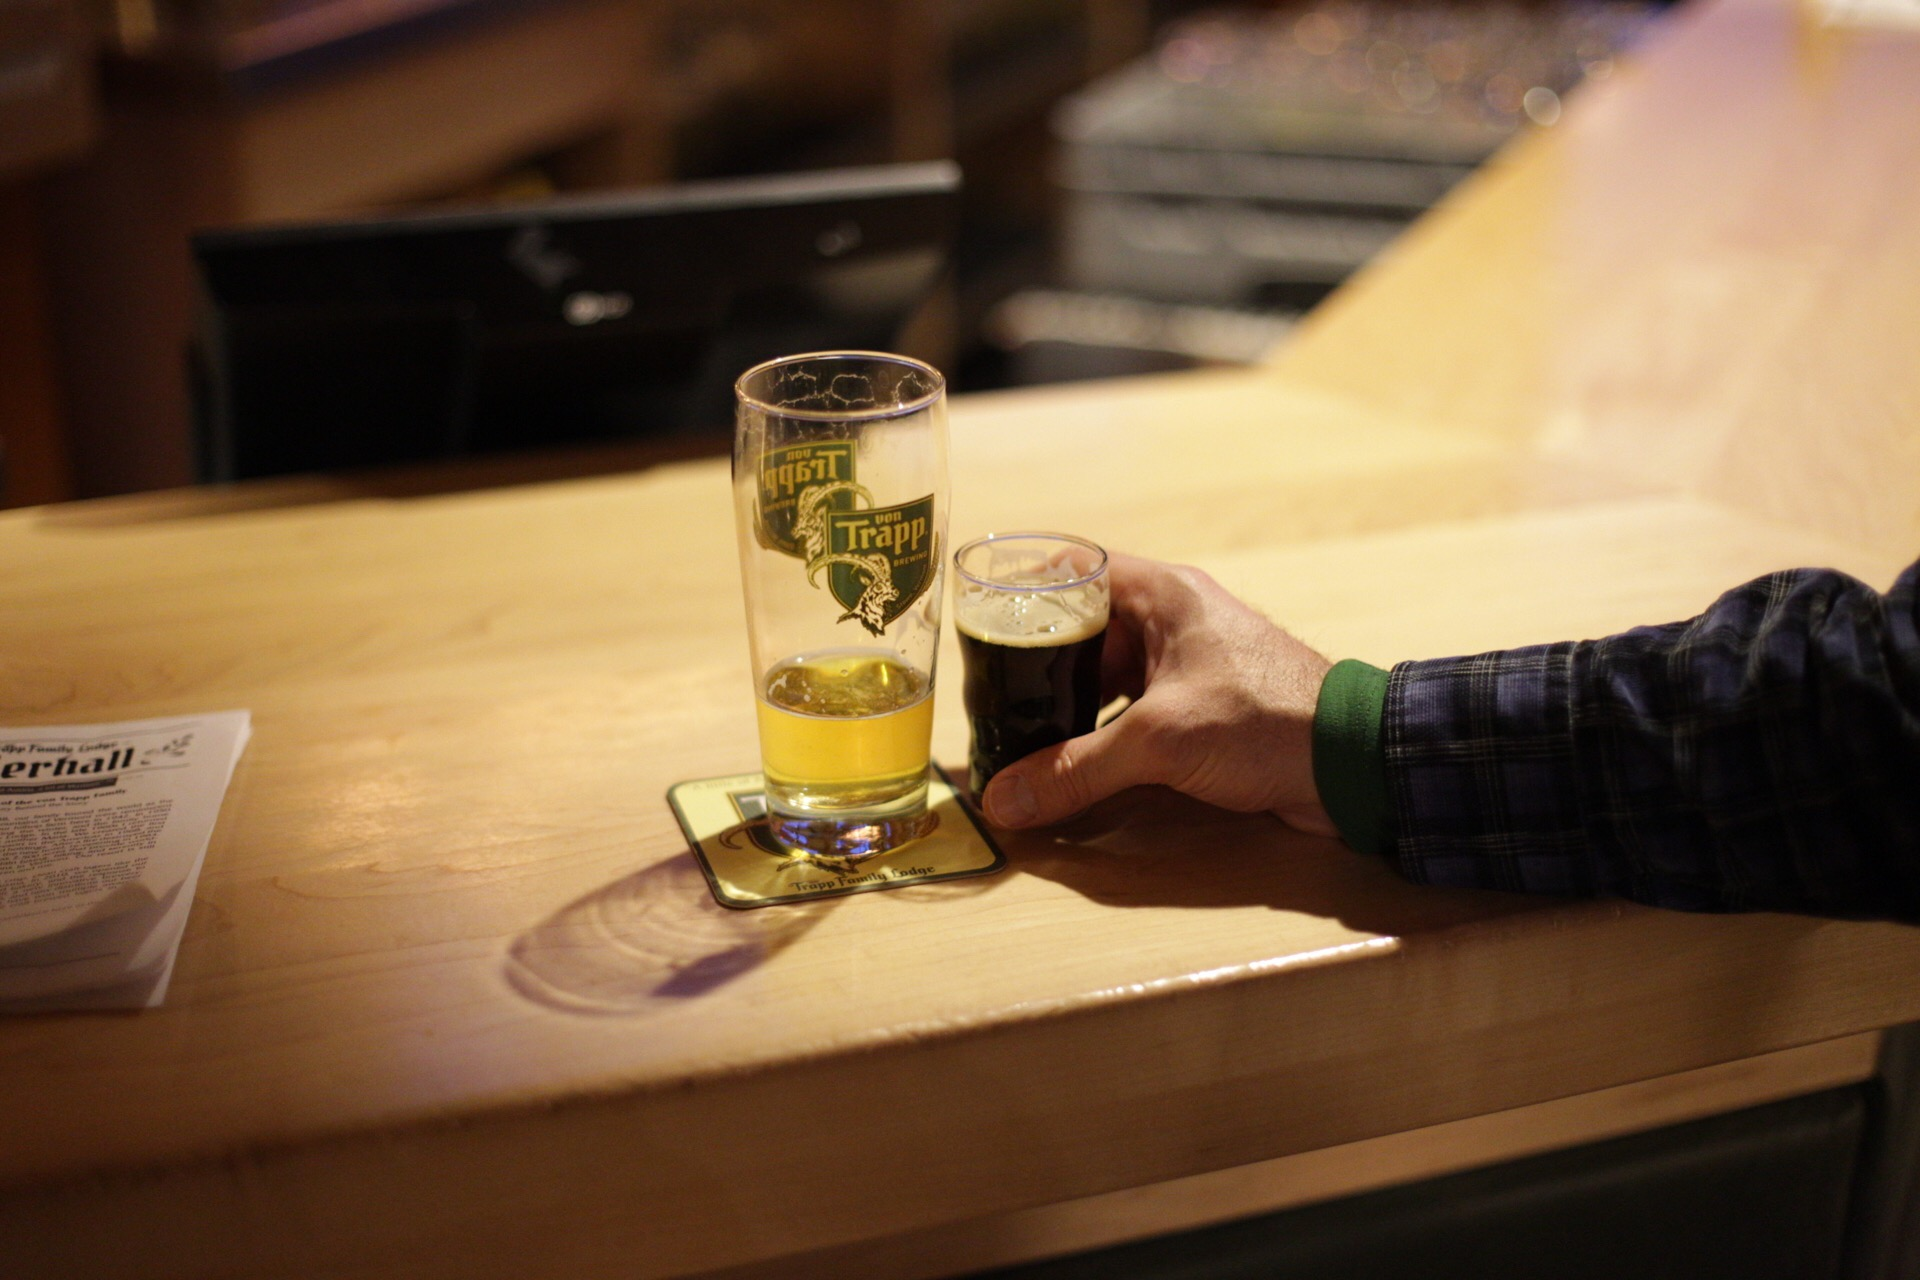 Detour: Stowe, VT – von Trapp Brewing